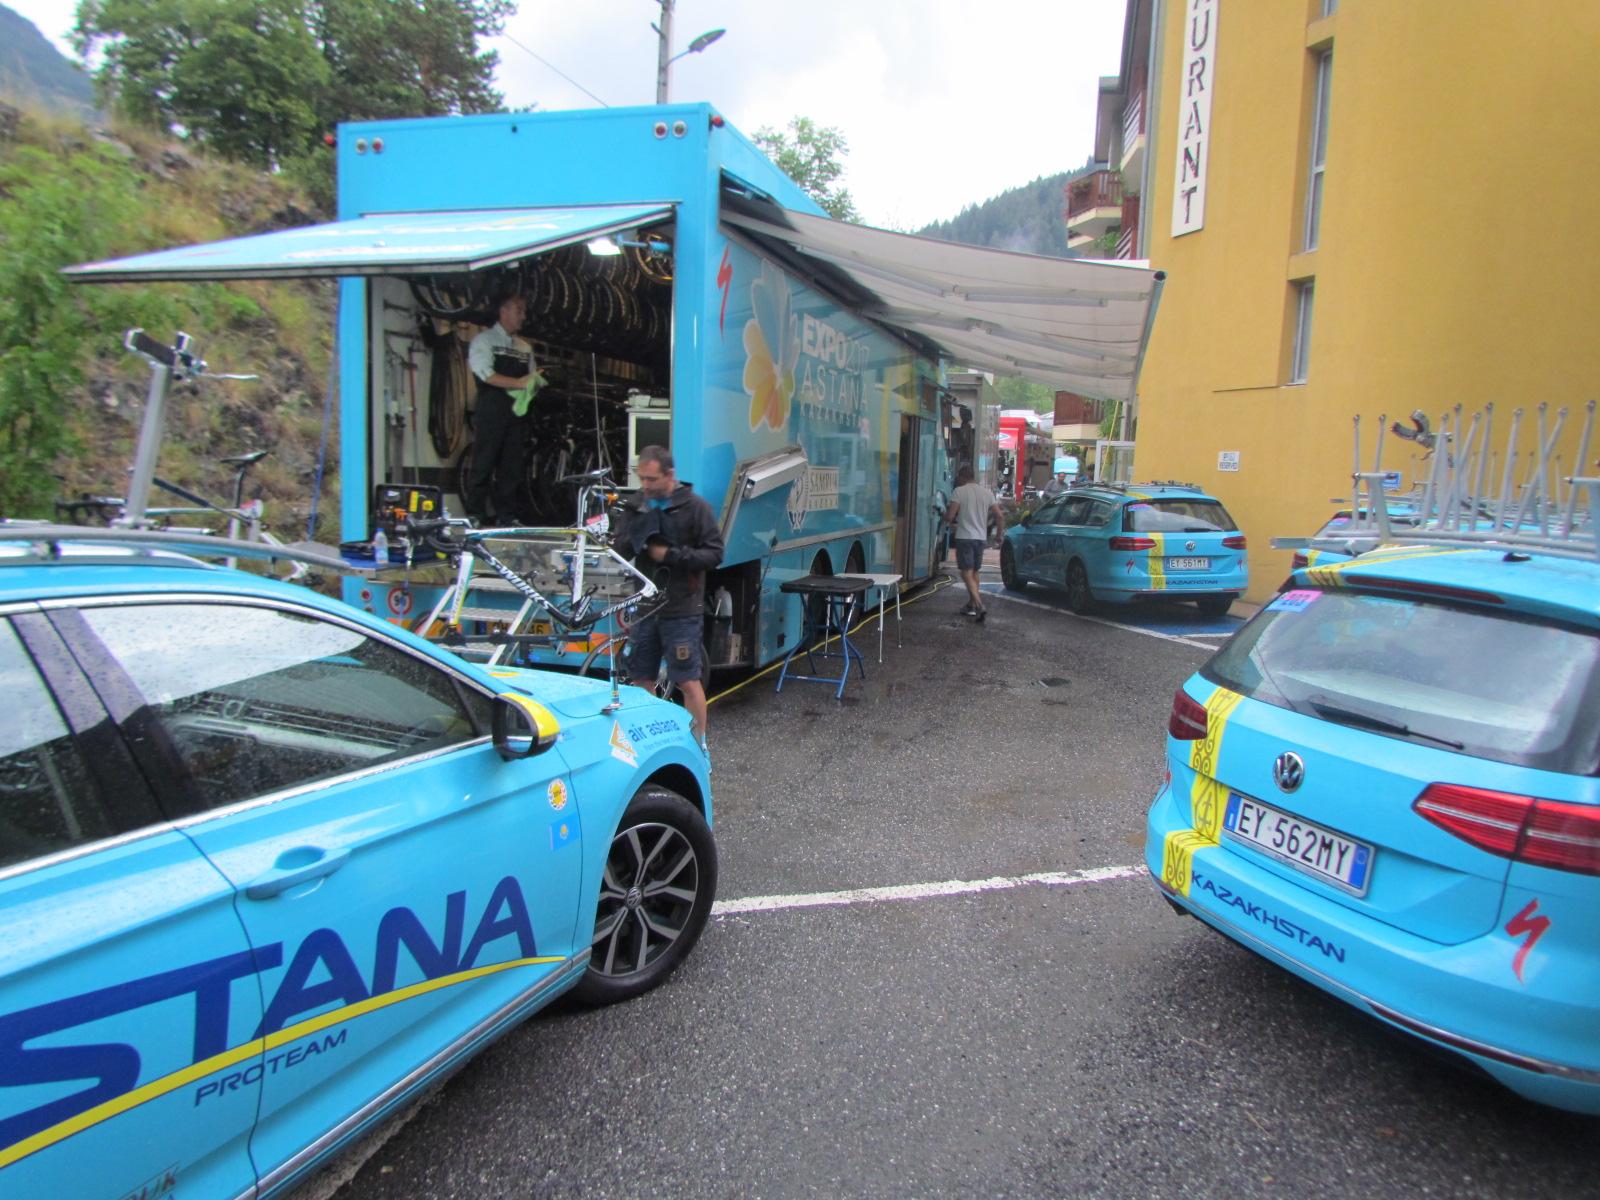 Team Astana